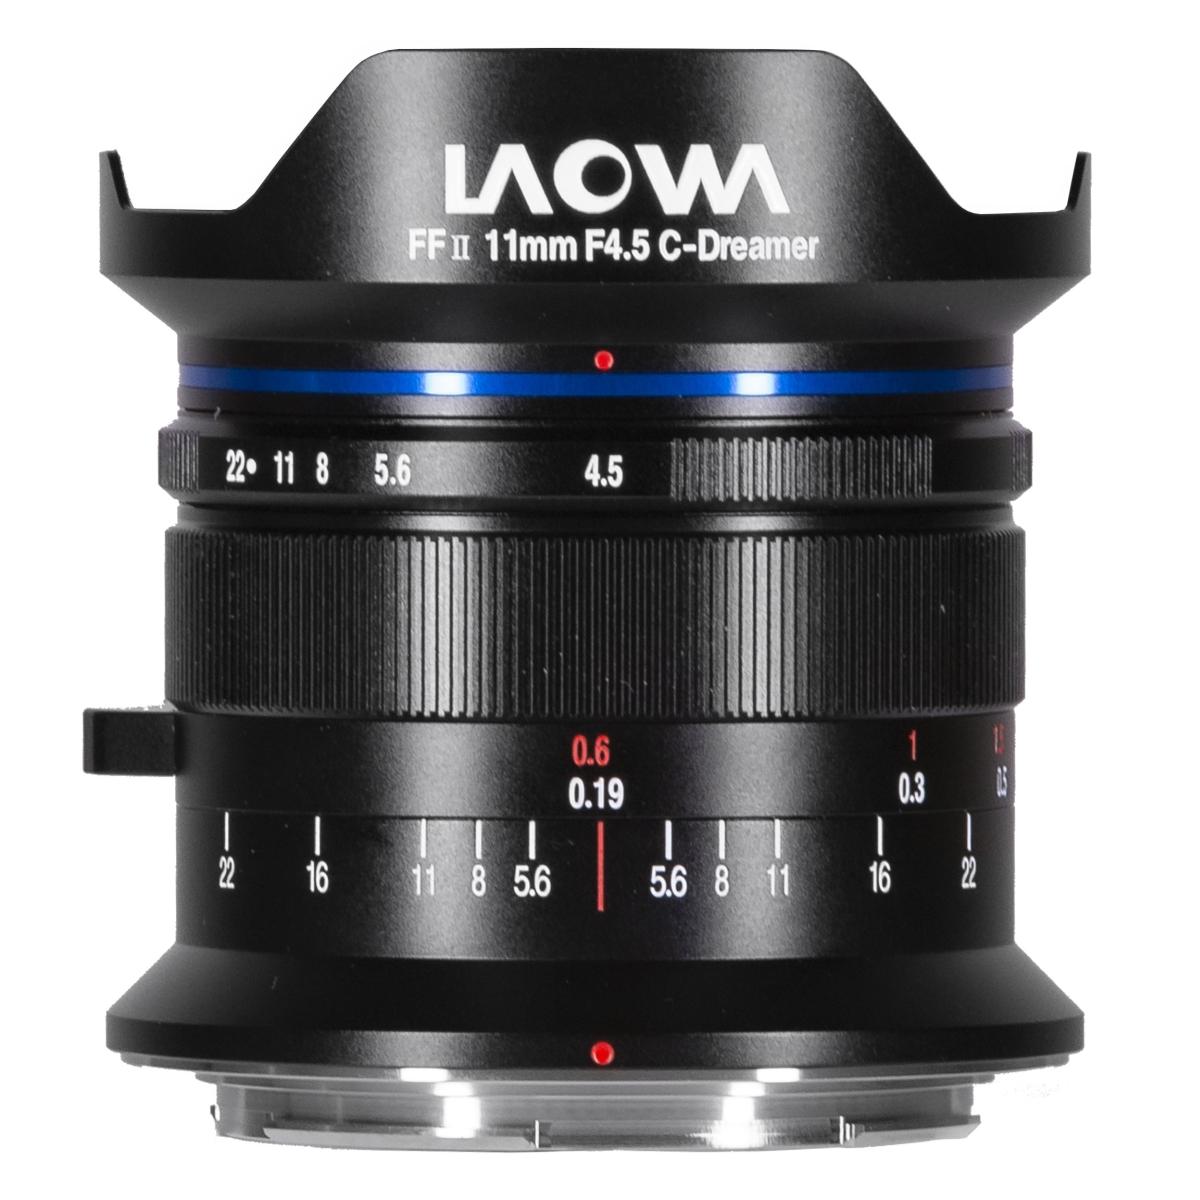 Laowa 11 mm 1:4,5 FF RL für Leica M